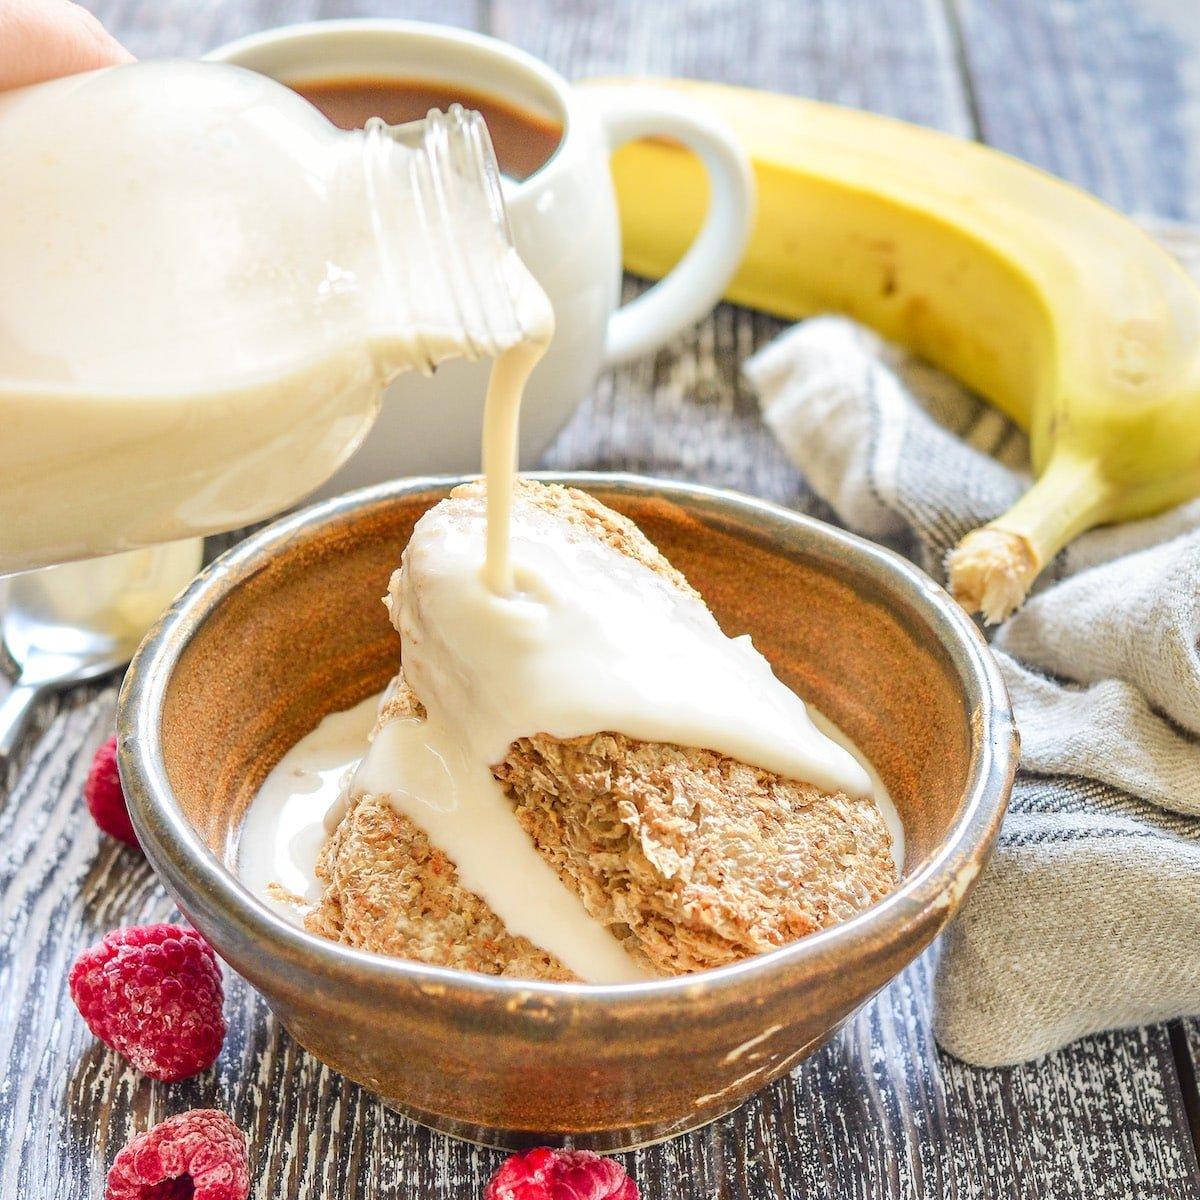 oat milk pouring